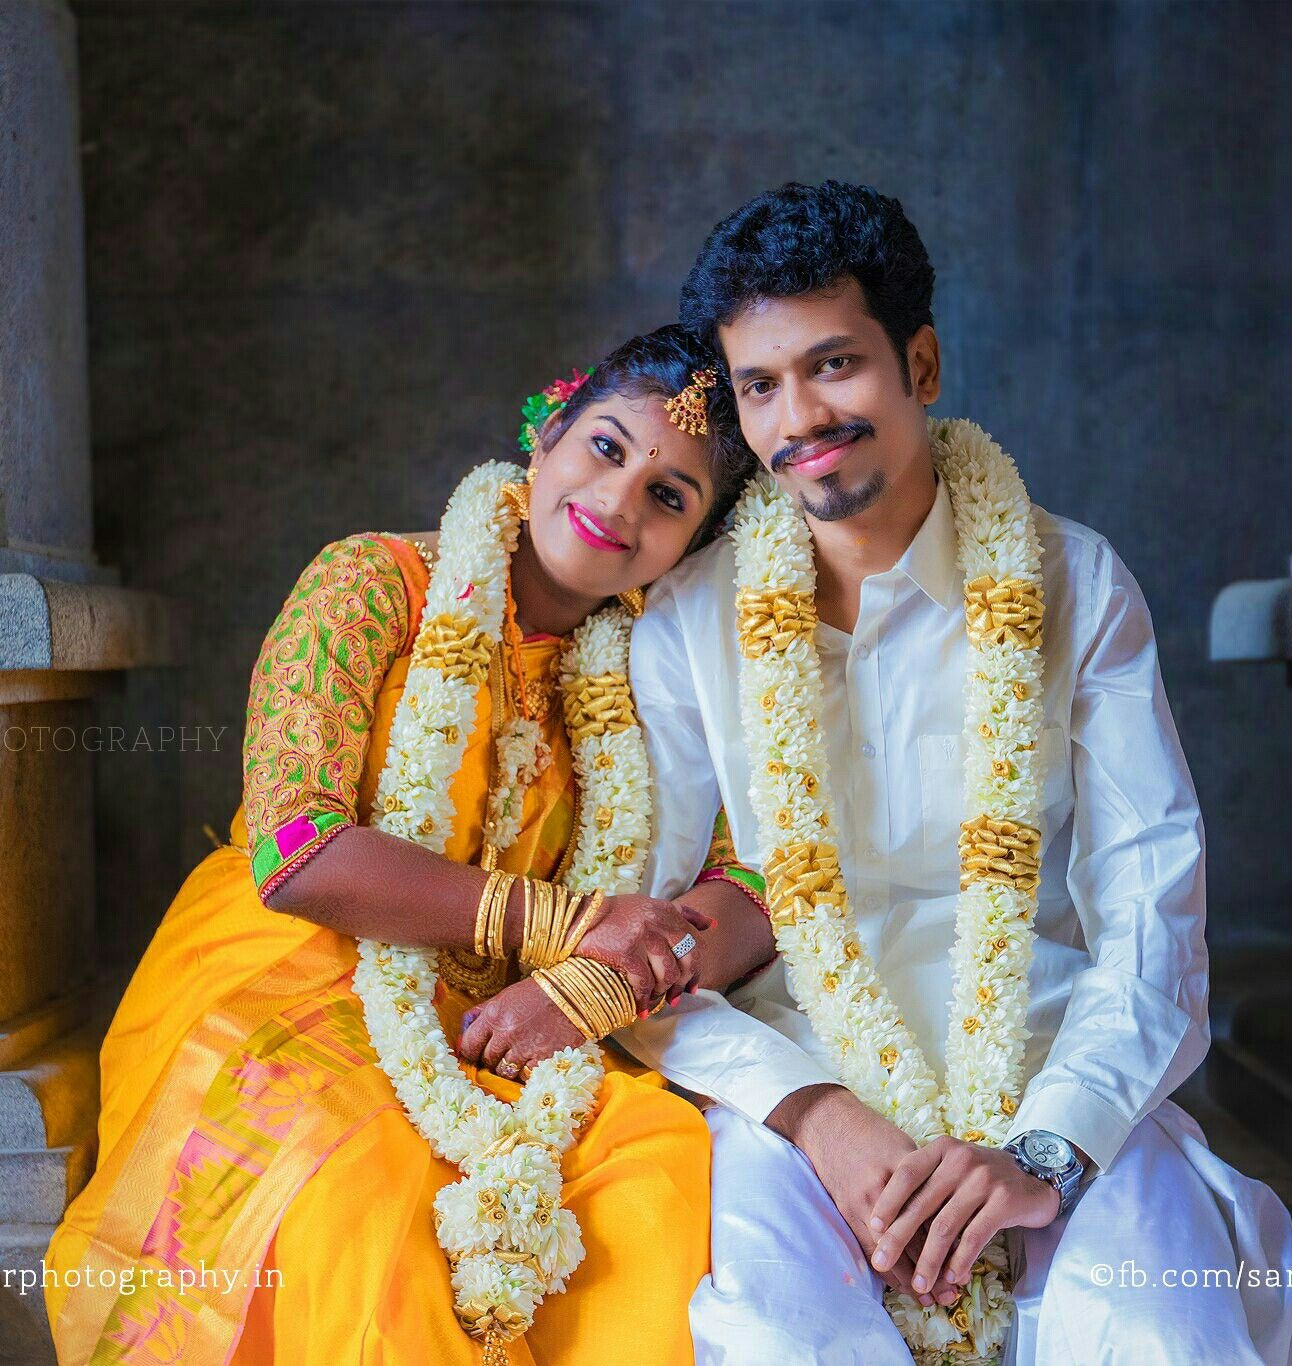 Pin By Vishnu Chandar On Wedding Indian Wedding Garland